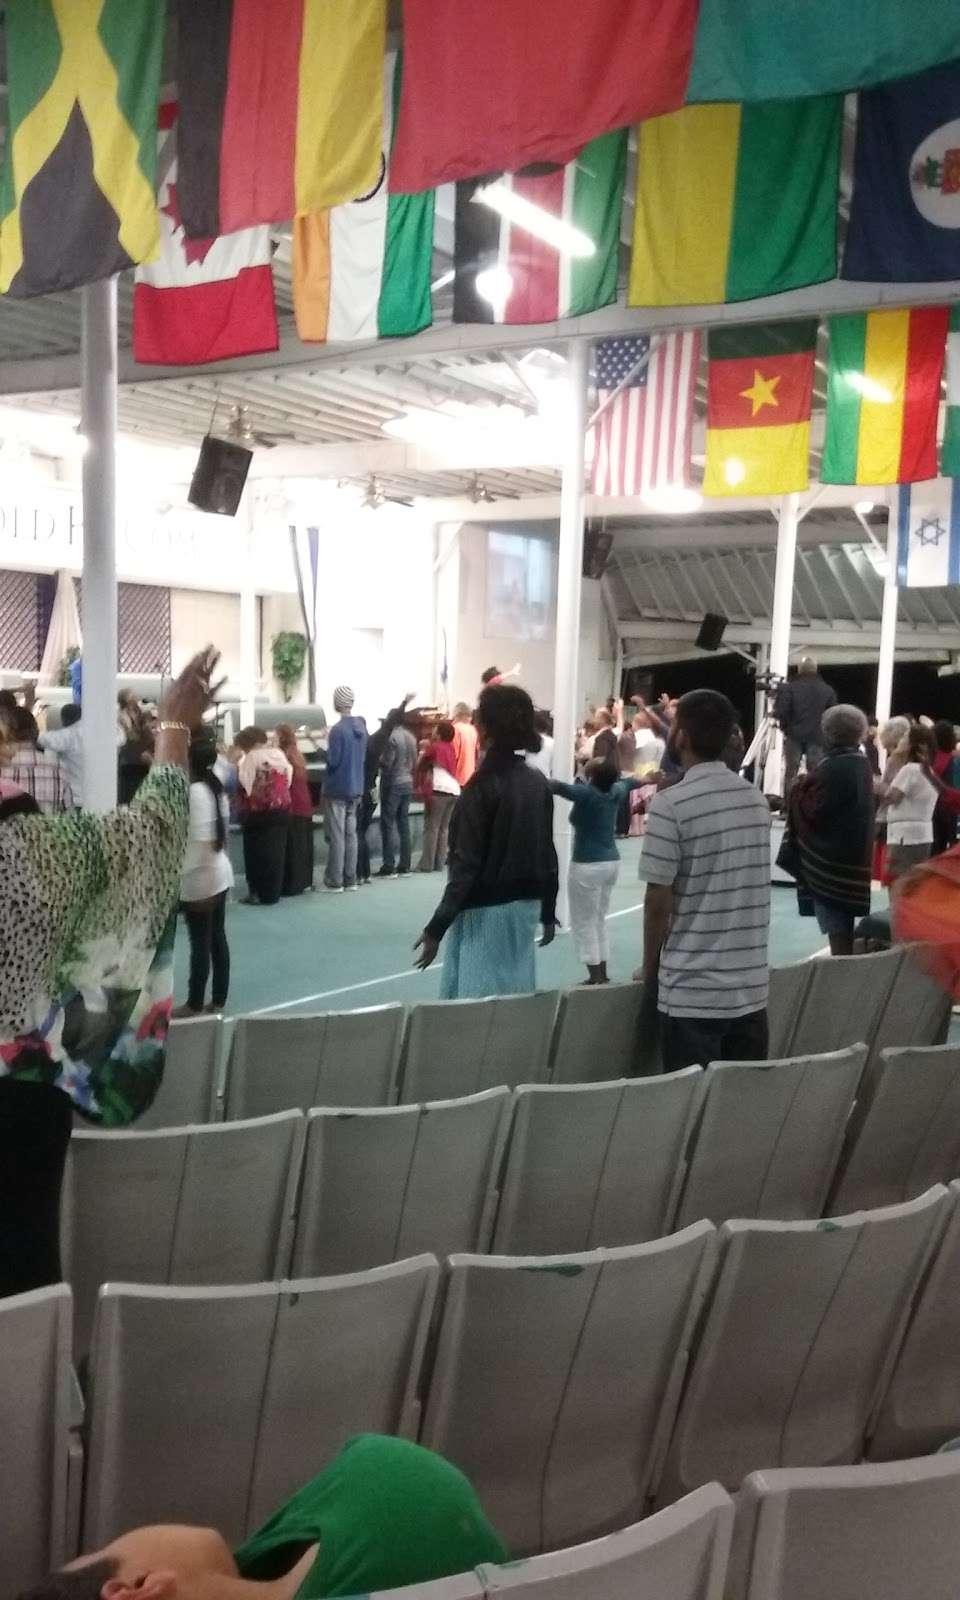 Calvary Pentecostal Tabernacle - church    Photo 7 of 10   Address: 11352 Heflin Ln, Ashland, VA 23005, USA   Phone: (804) 798-7756